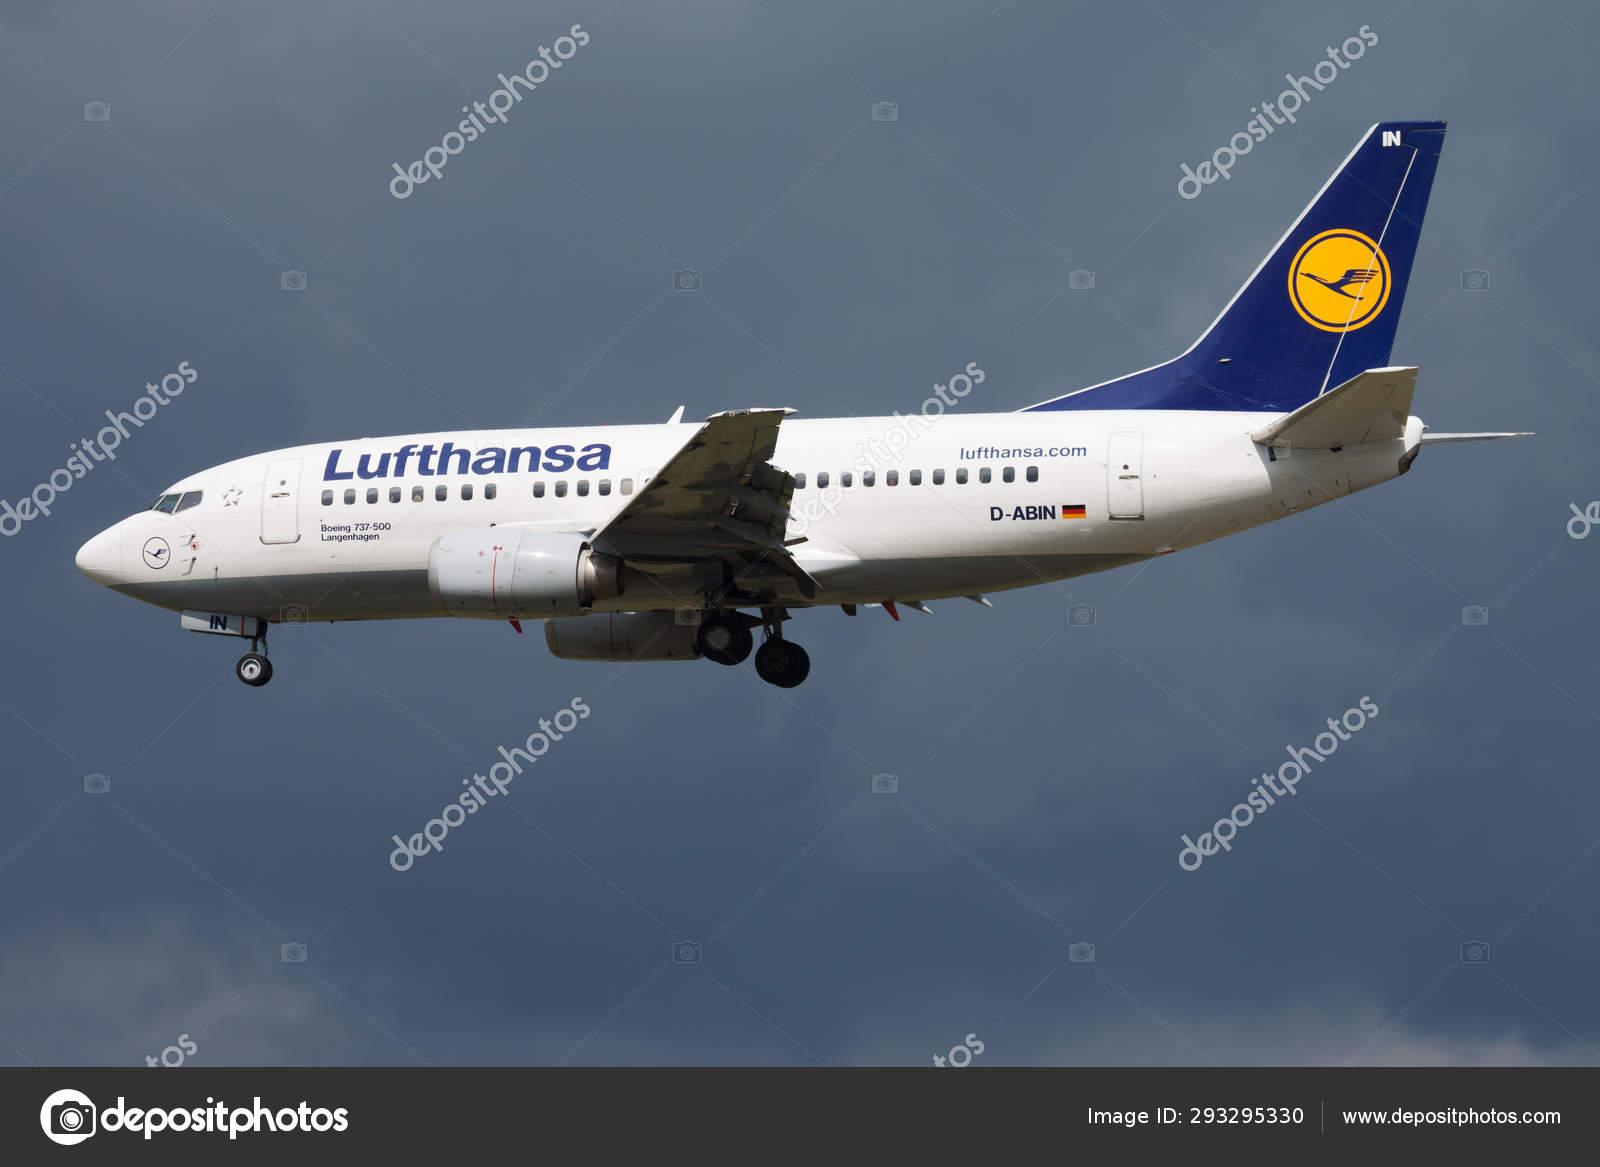 Lufthansa Boeing 737 500 D Abin Passenger Plane Landing At Frankfurt Airport Stock Editorial Photo C Soosjozsef 293295330